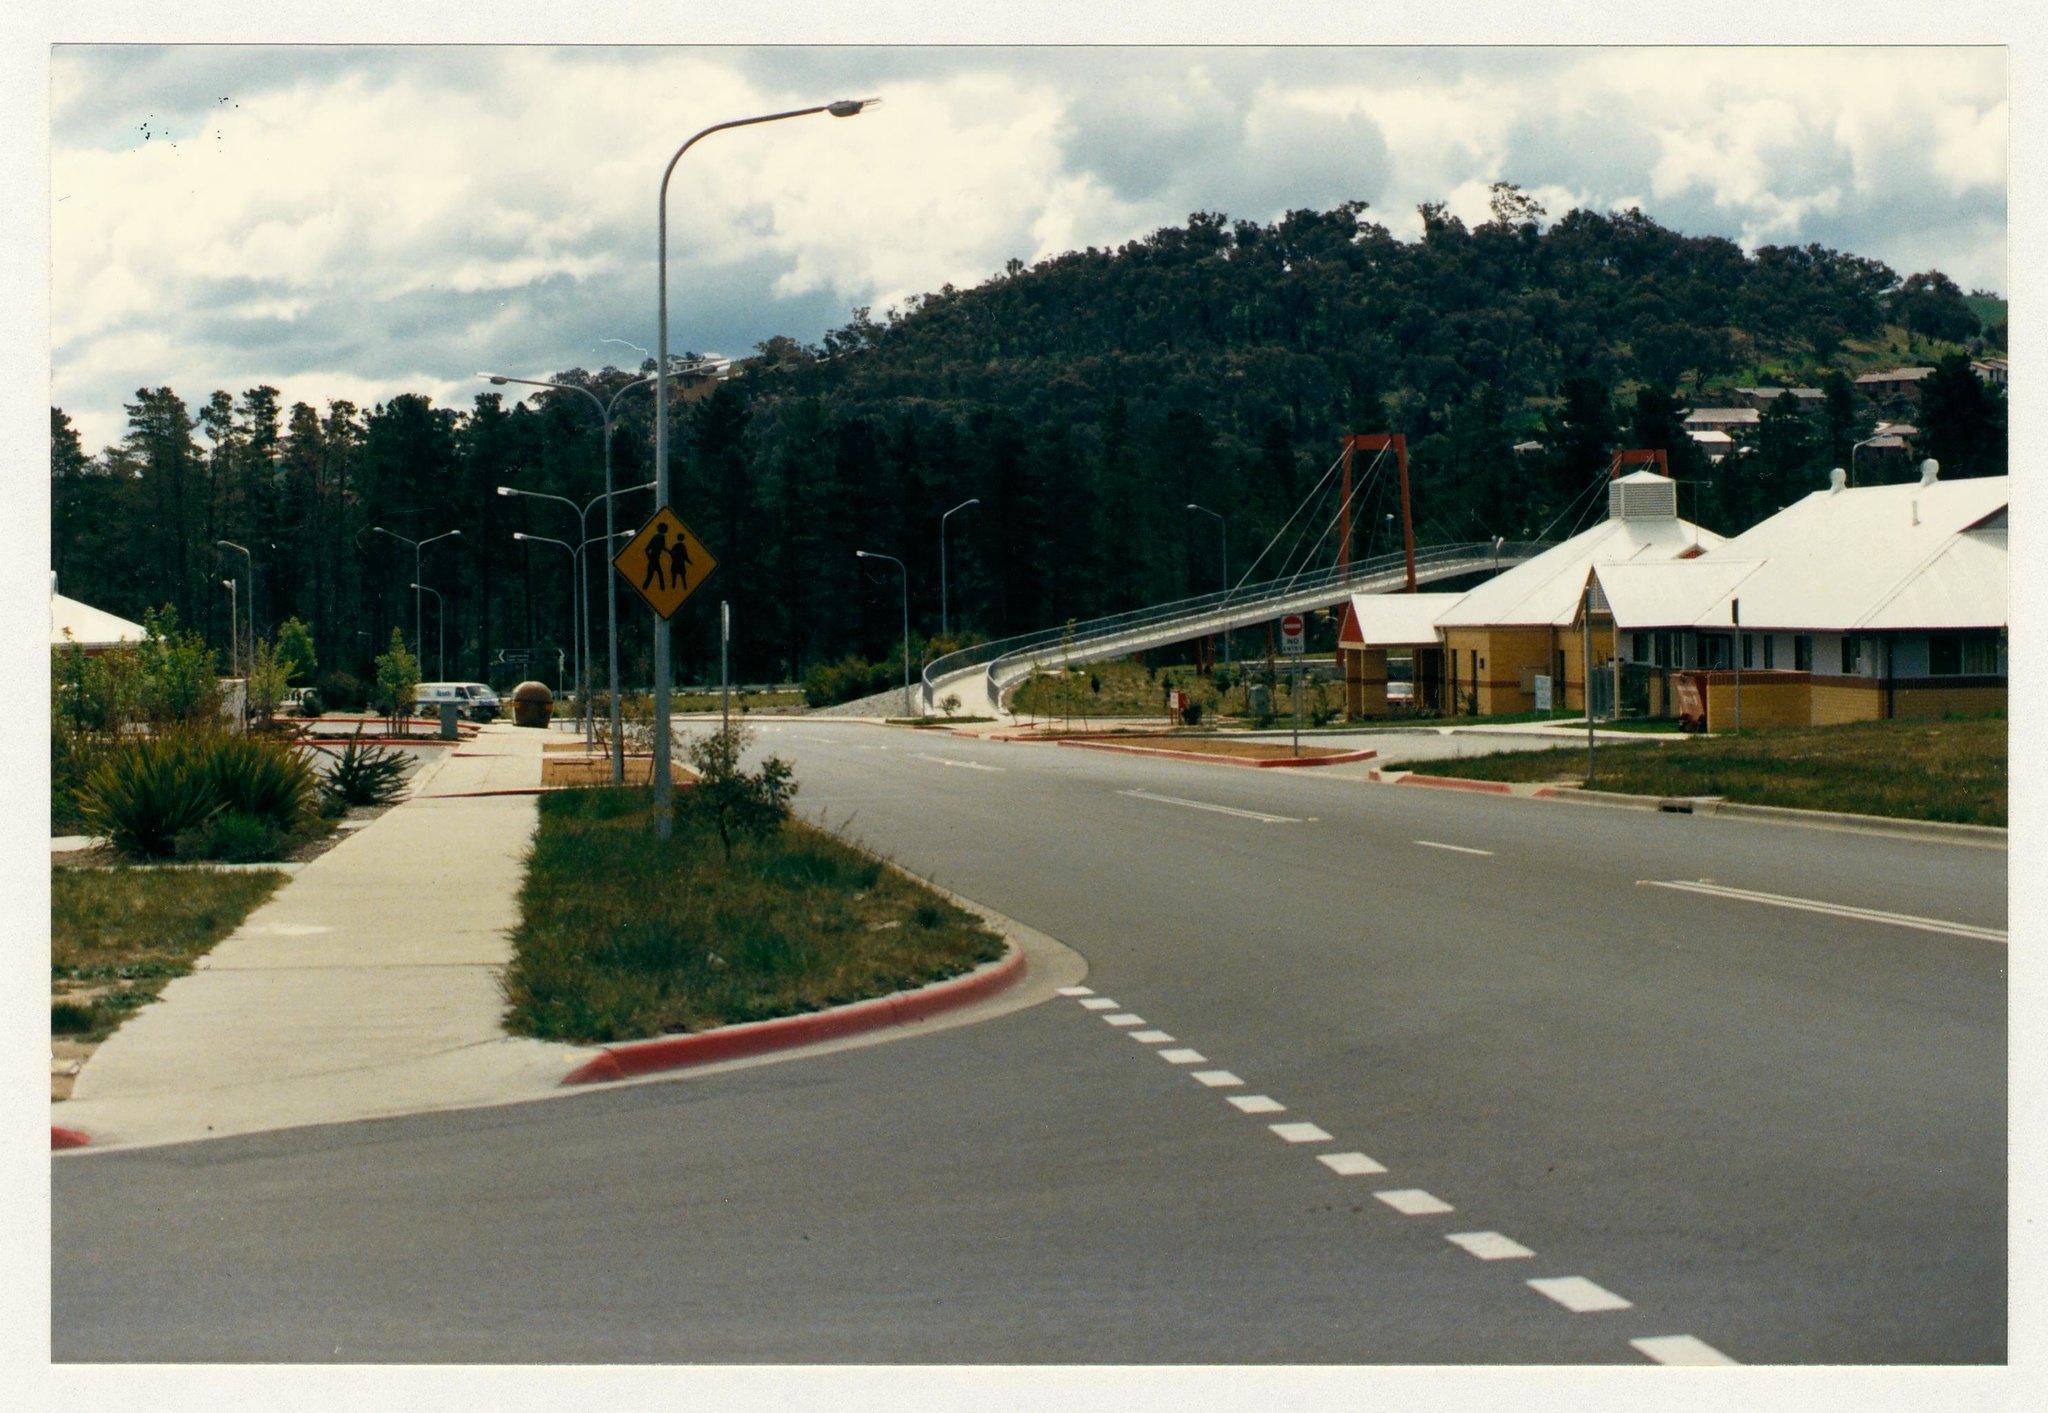 Isabella Drive overpass at Chisholm shops. c1989